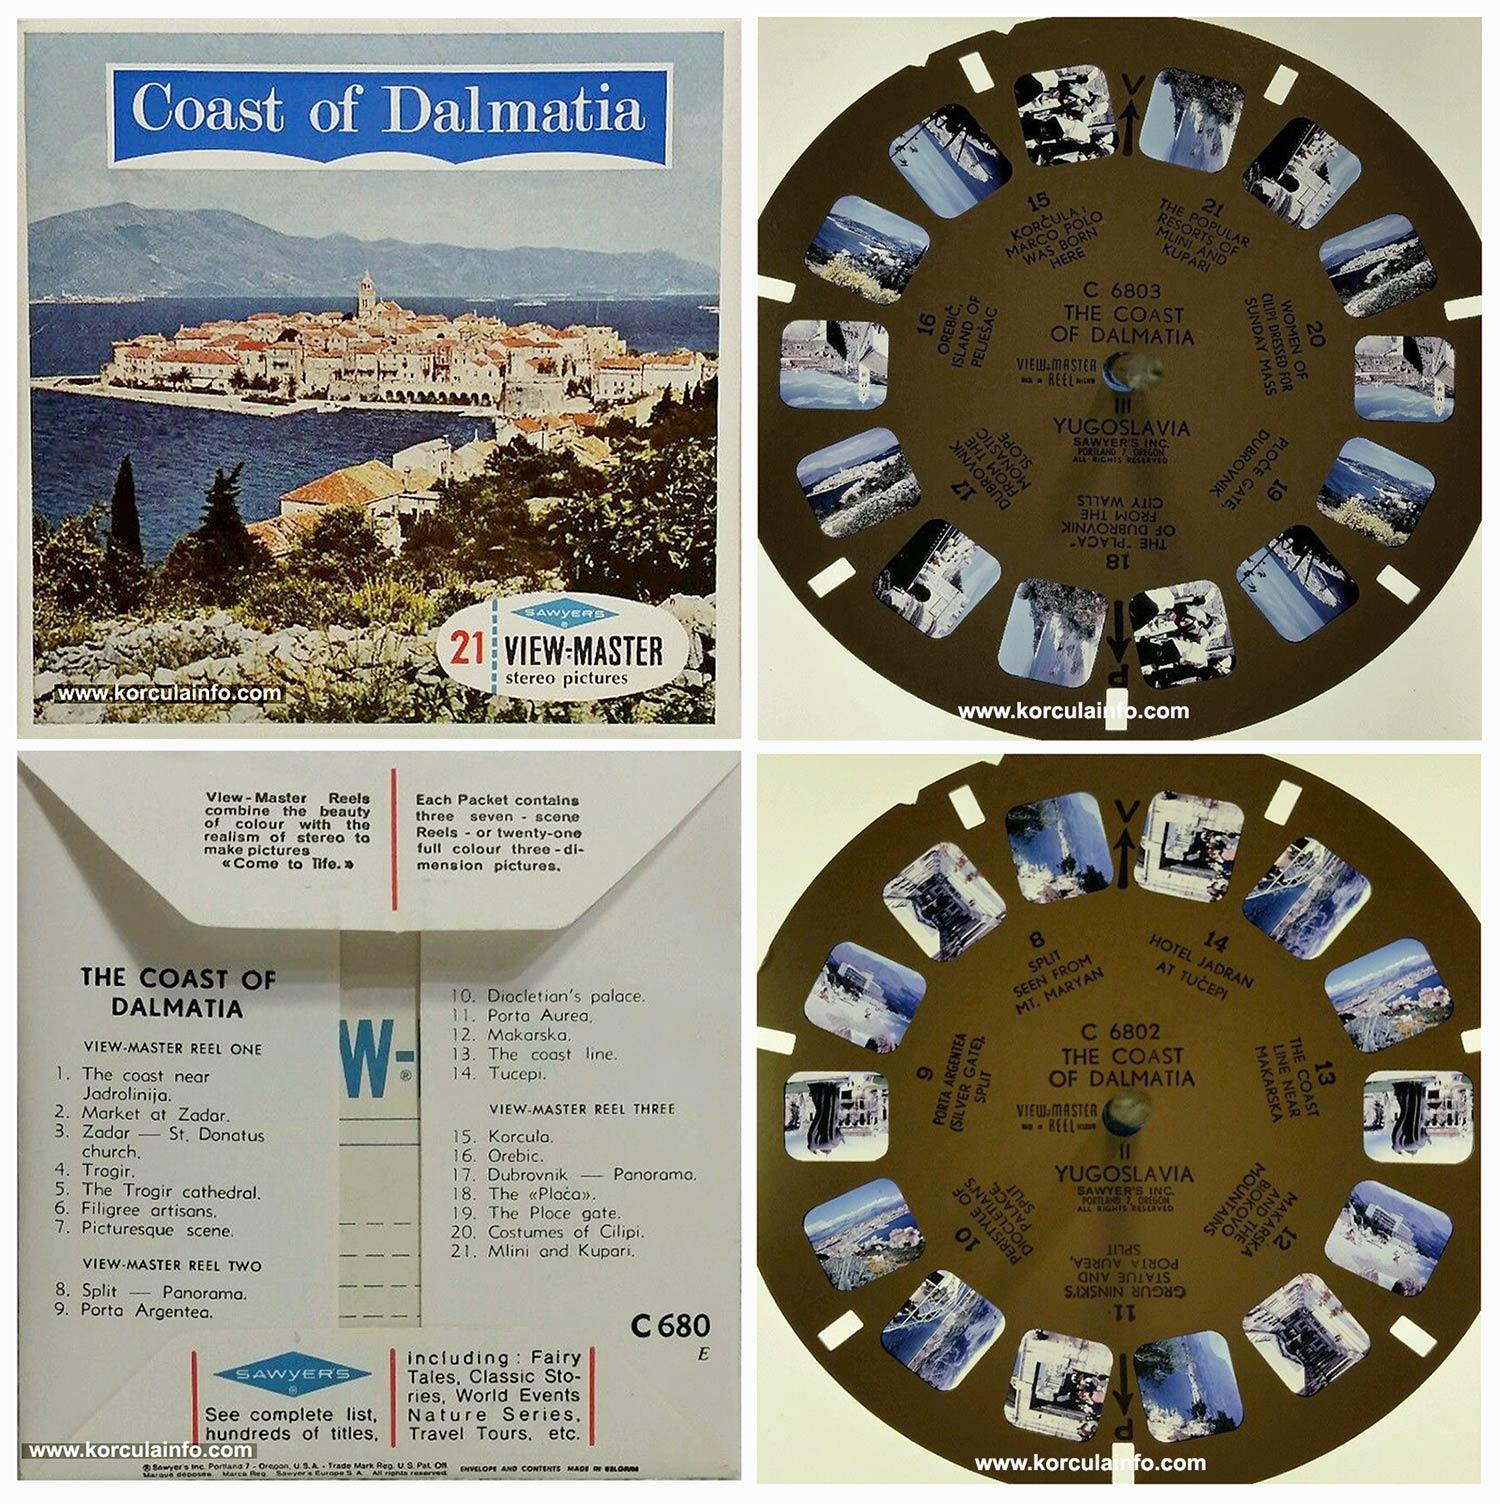 Korcula @ The Coast of Dalmatia stereoscopic Sawyer's View-Master reel